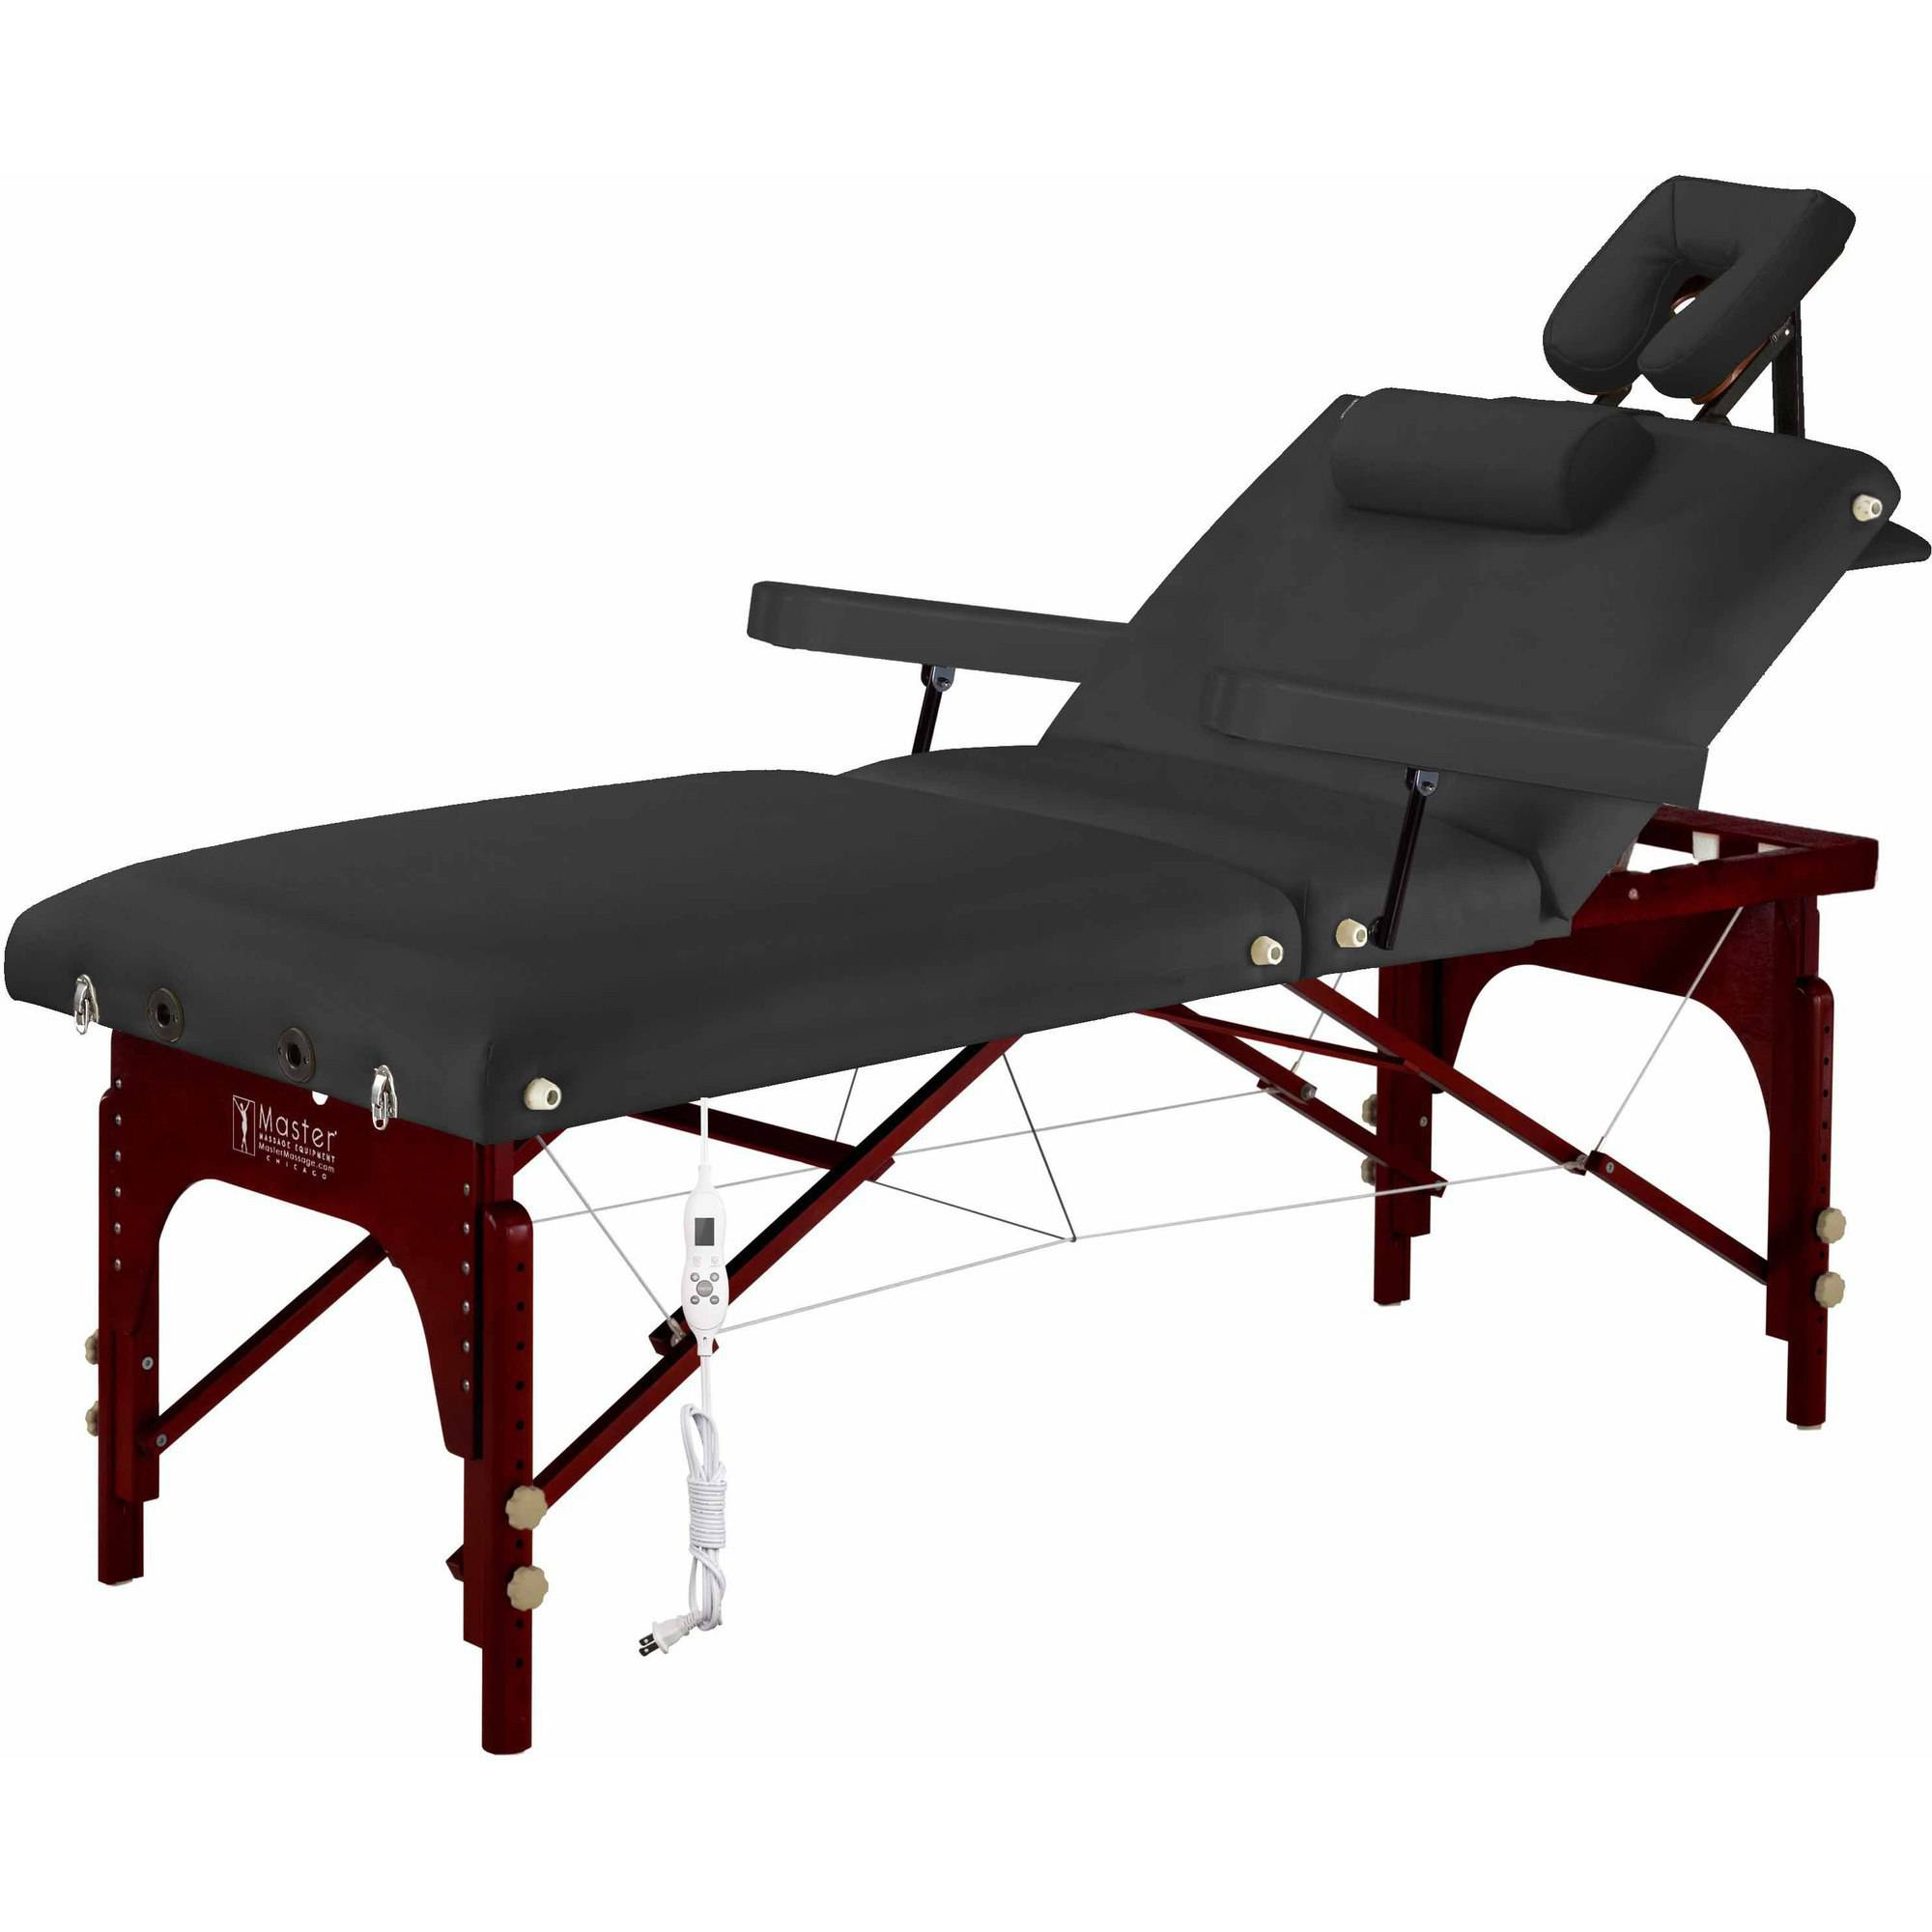 "Master Massage 31"" Montclair Salon Therma-Top Package Massage Table, Black"